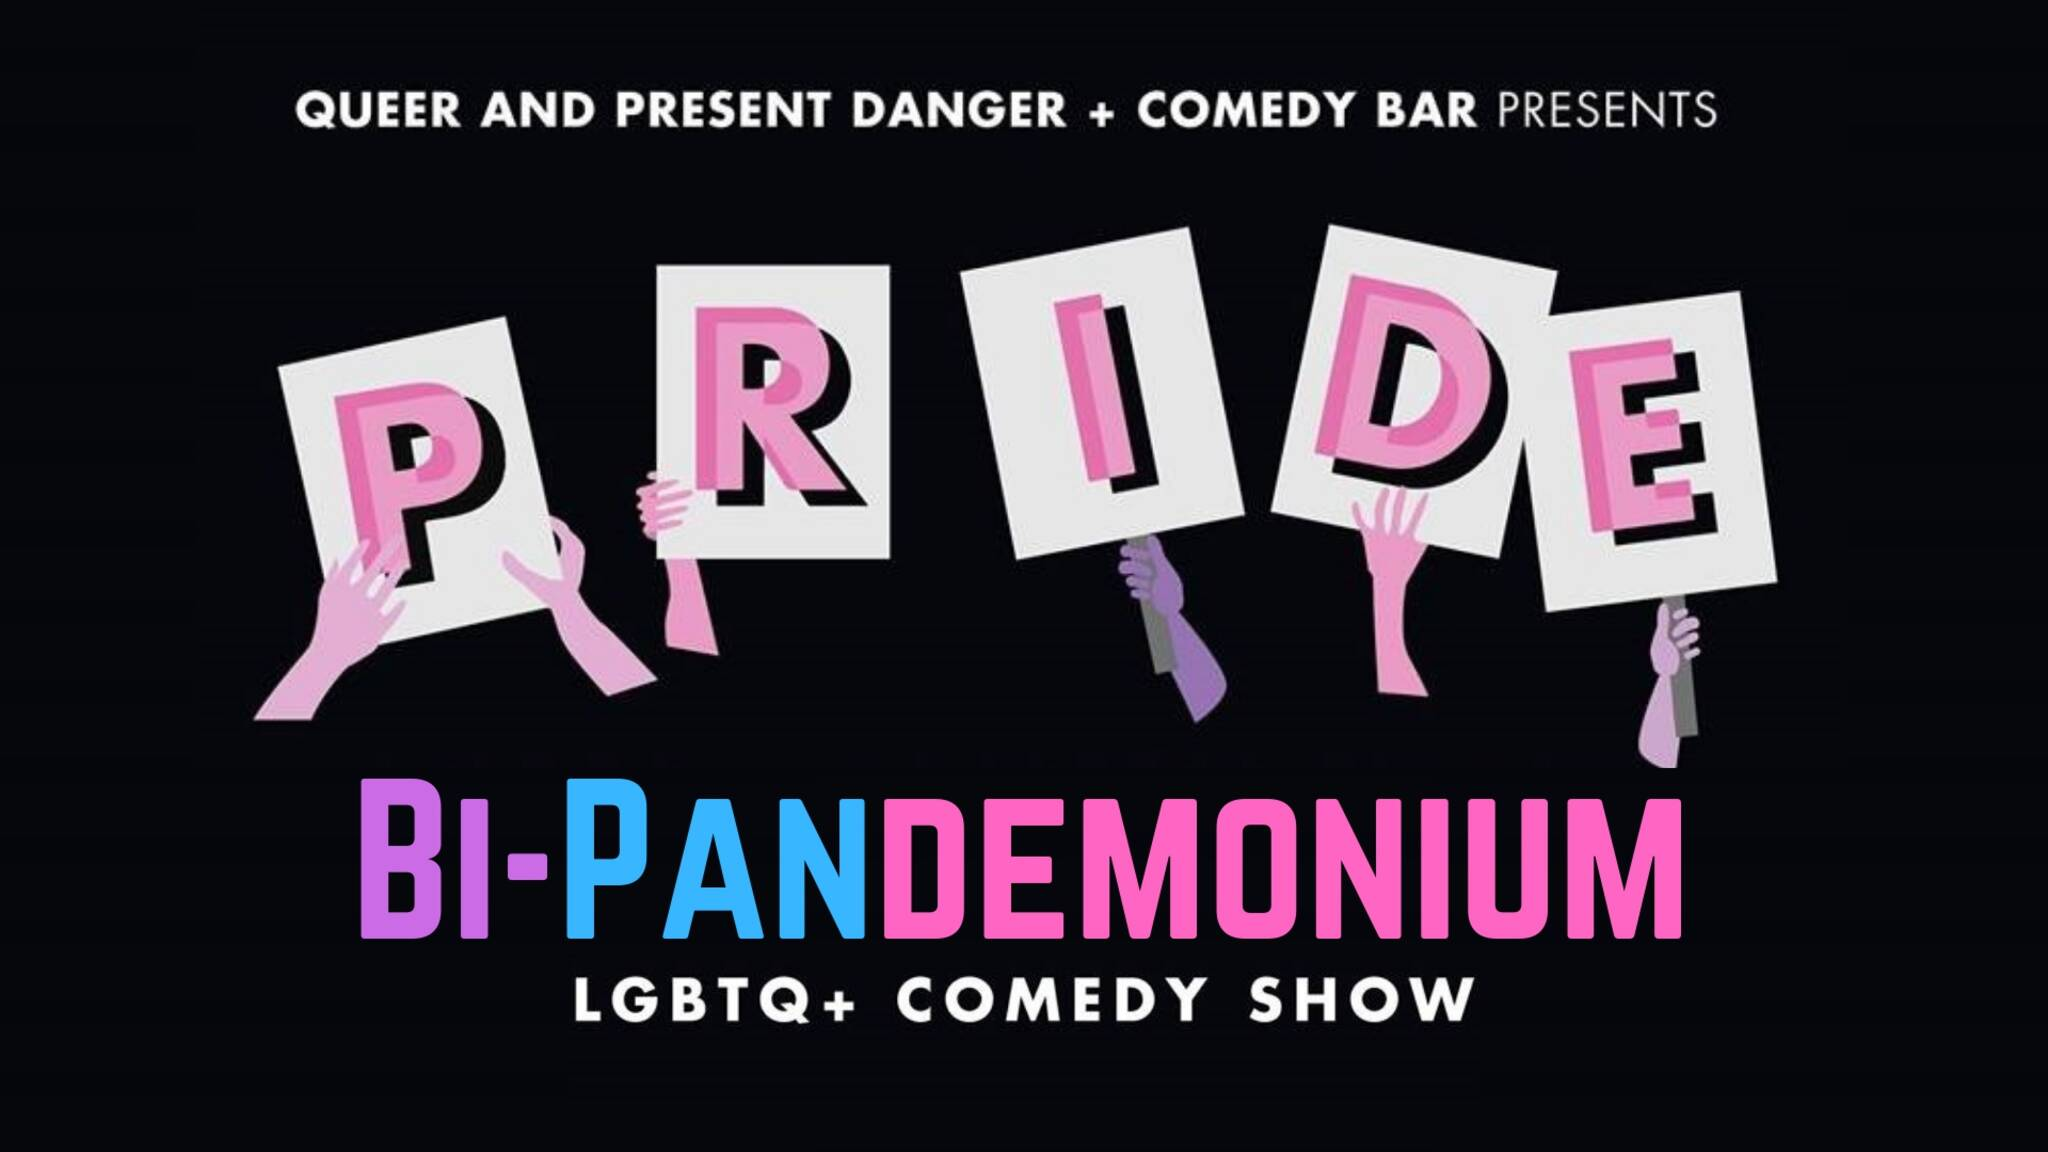 Bi-Pandemonium